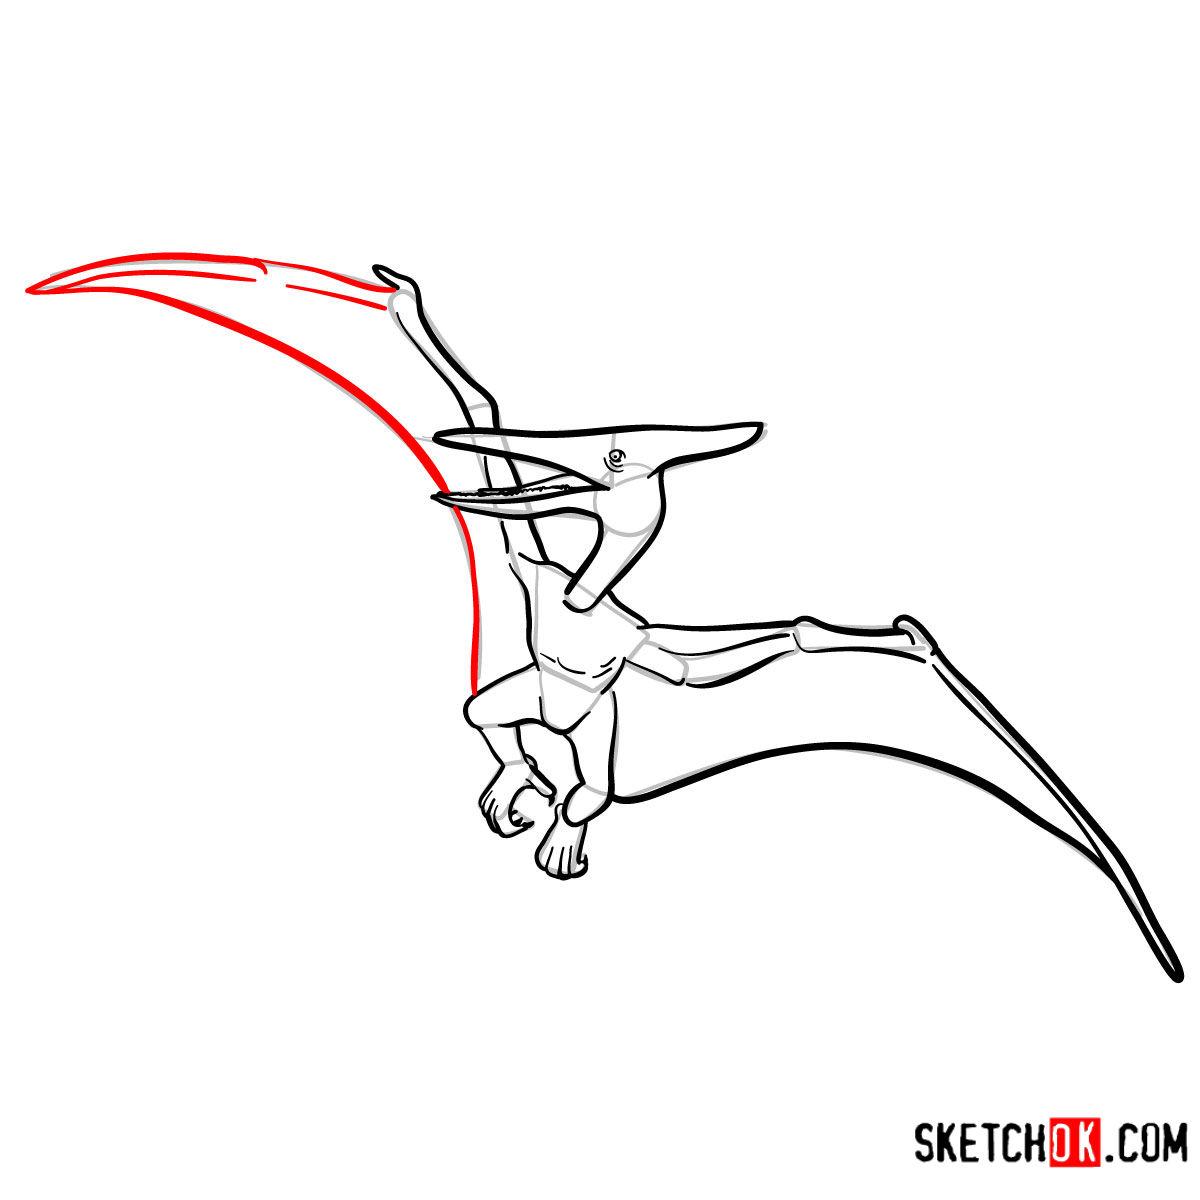 How to draw a Pterodactylus   Extinct Animals - step 11